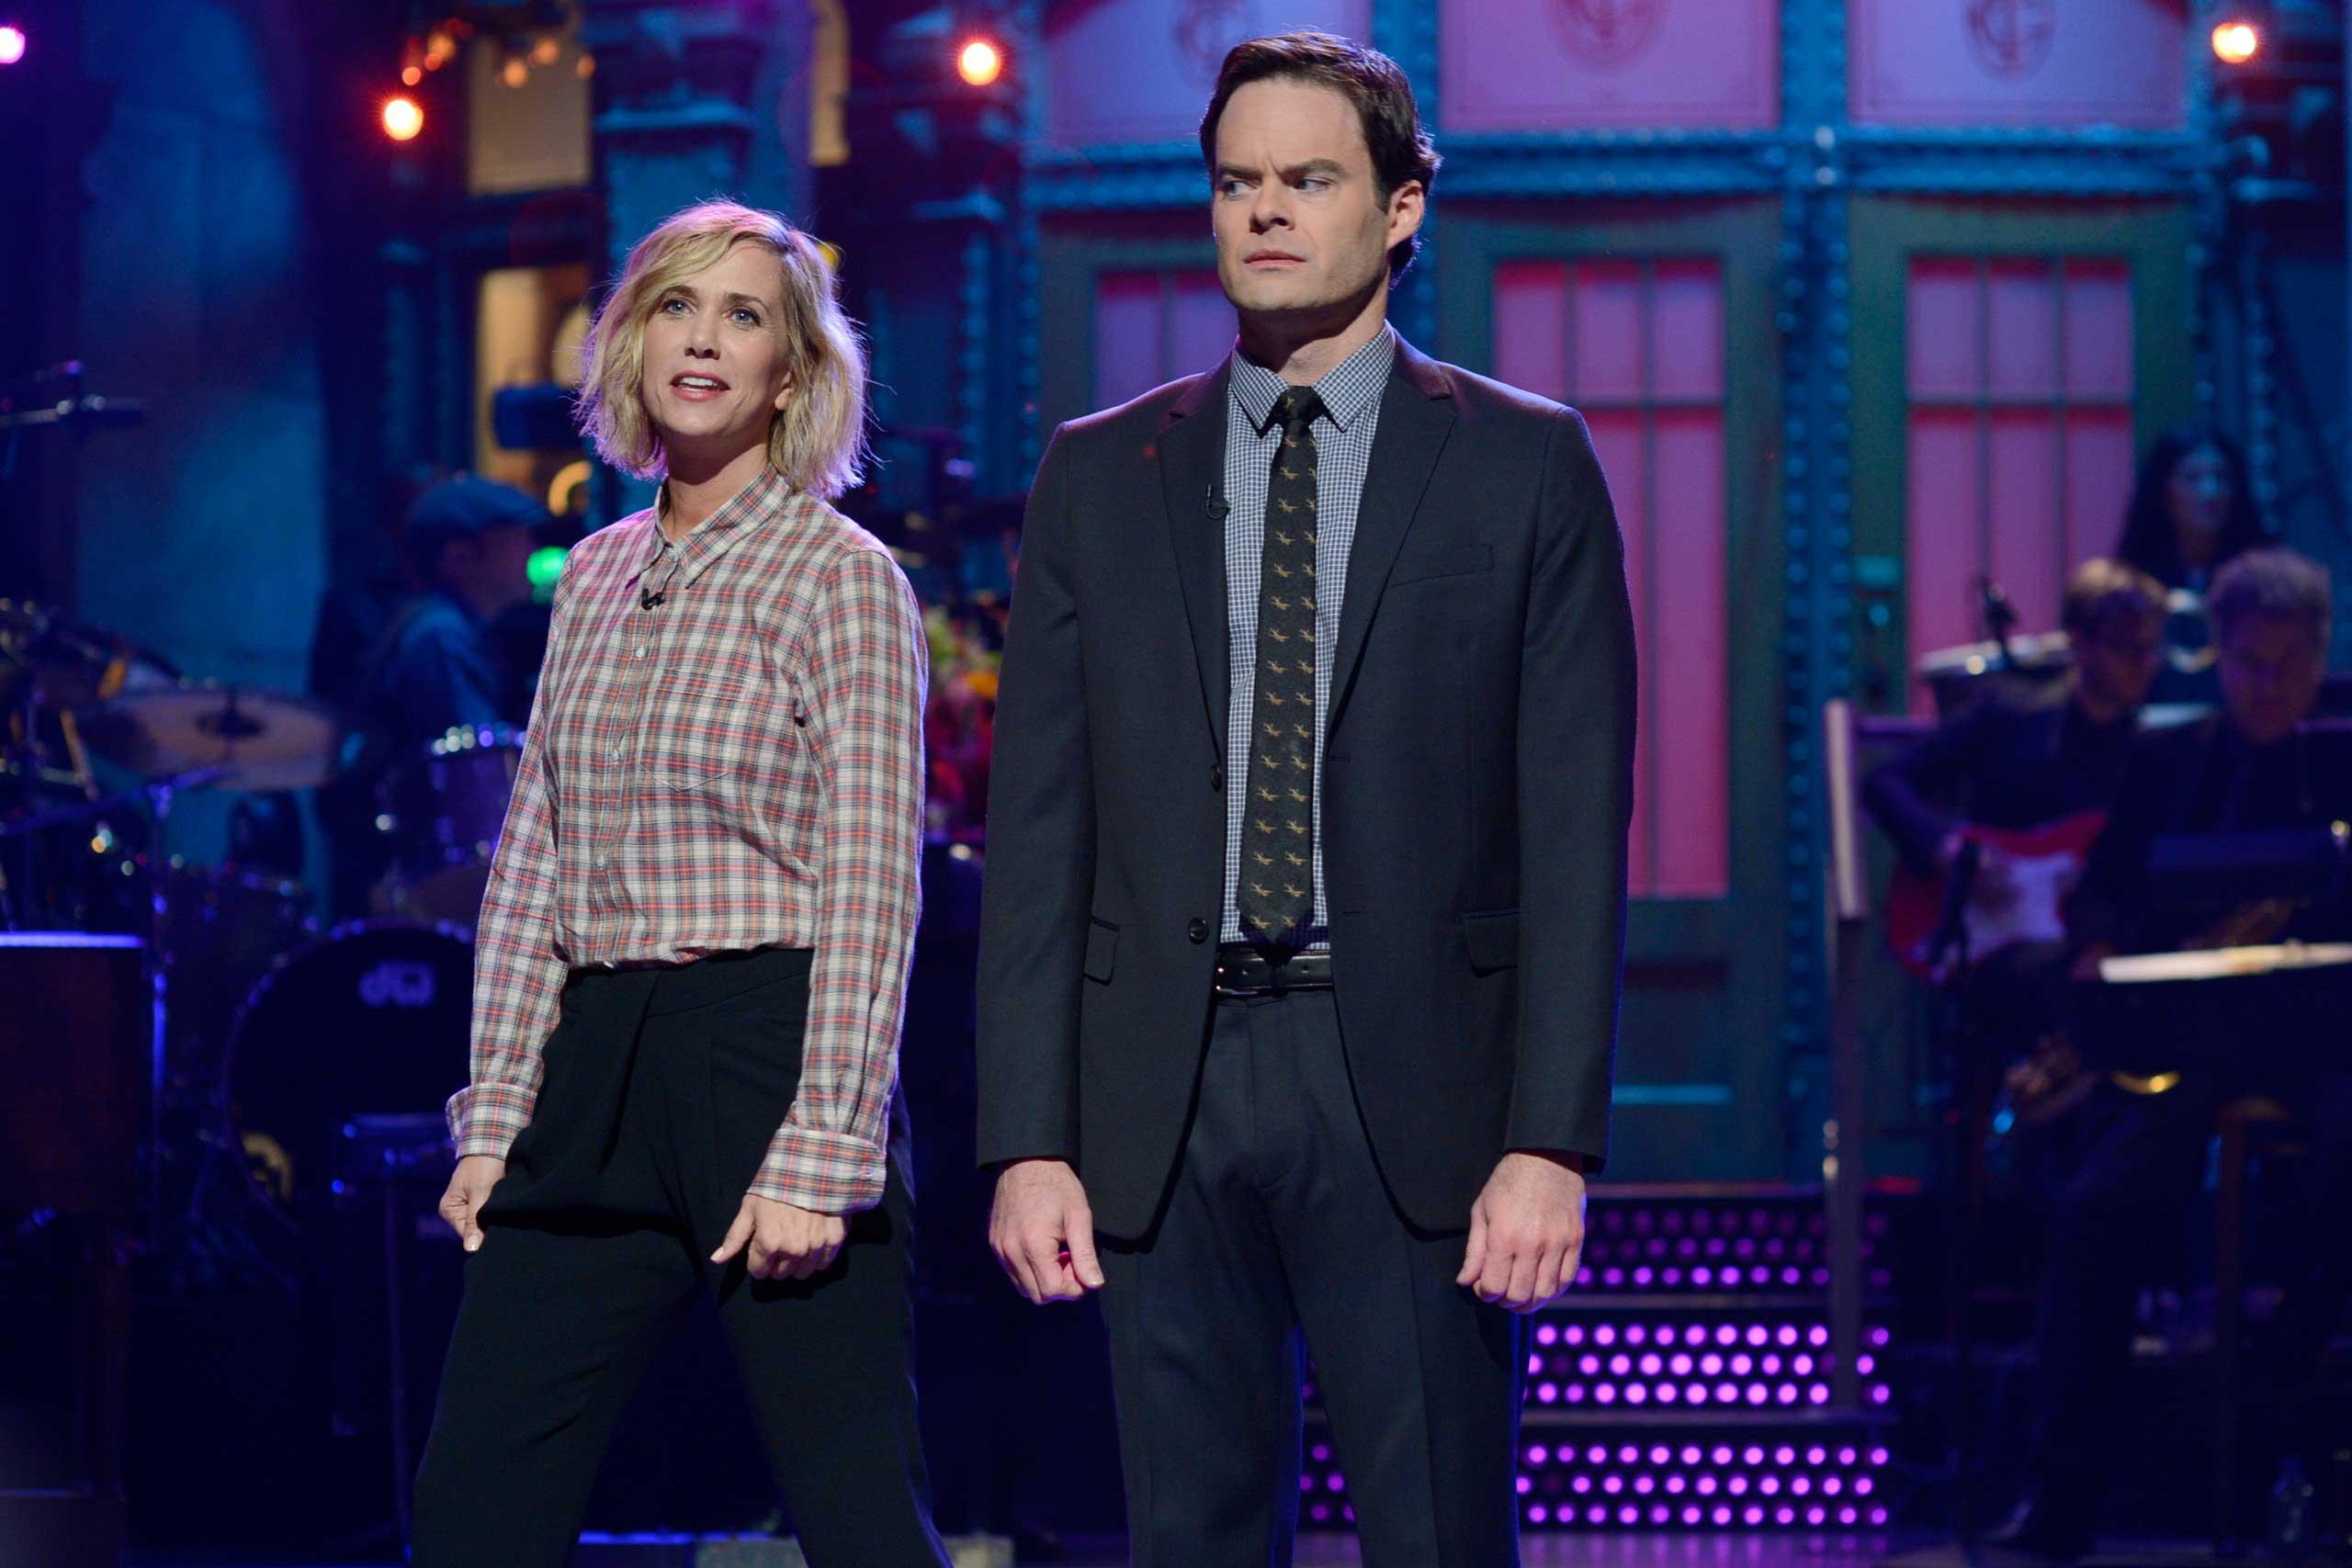 Kristen Wiig and Bill Hader on Saturday Night Live on Oct. 11, 2014.